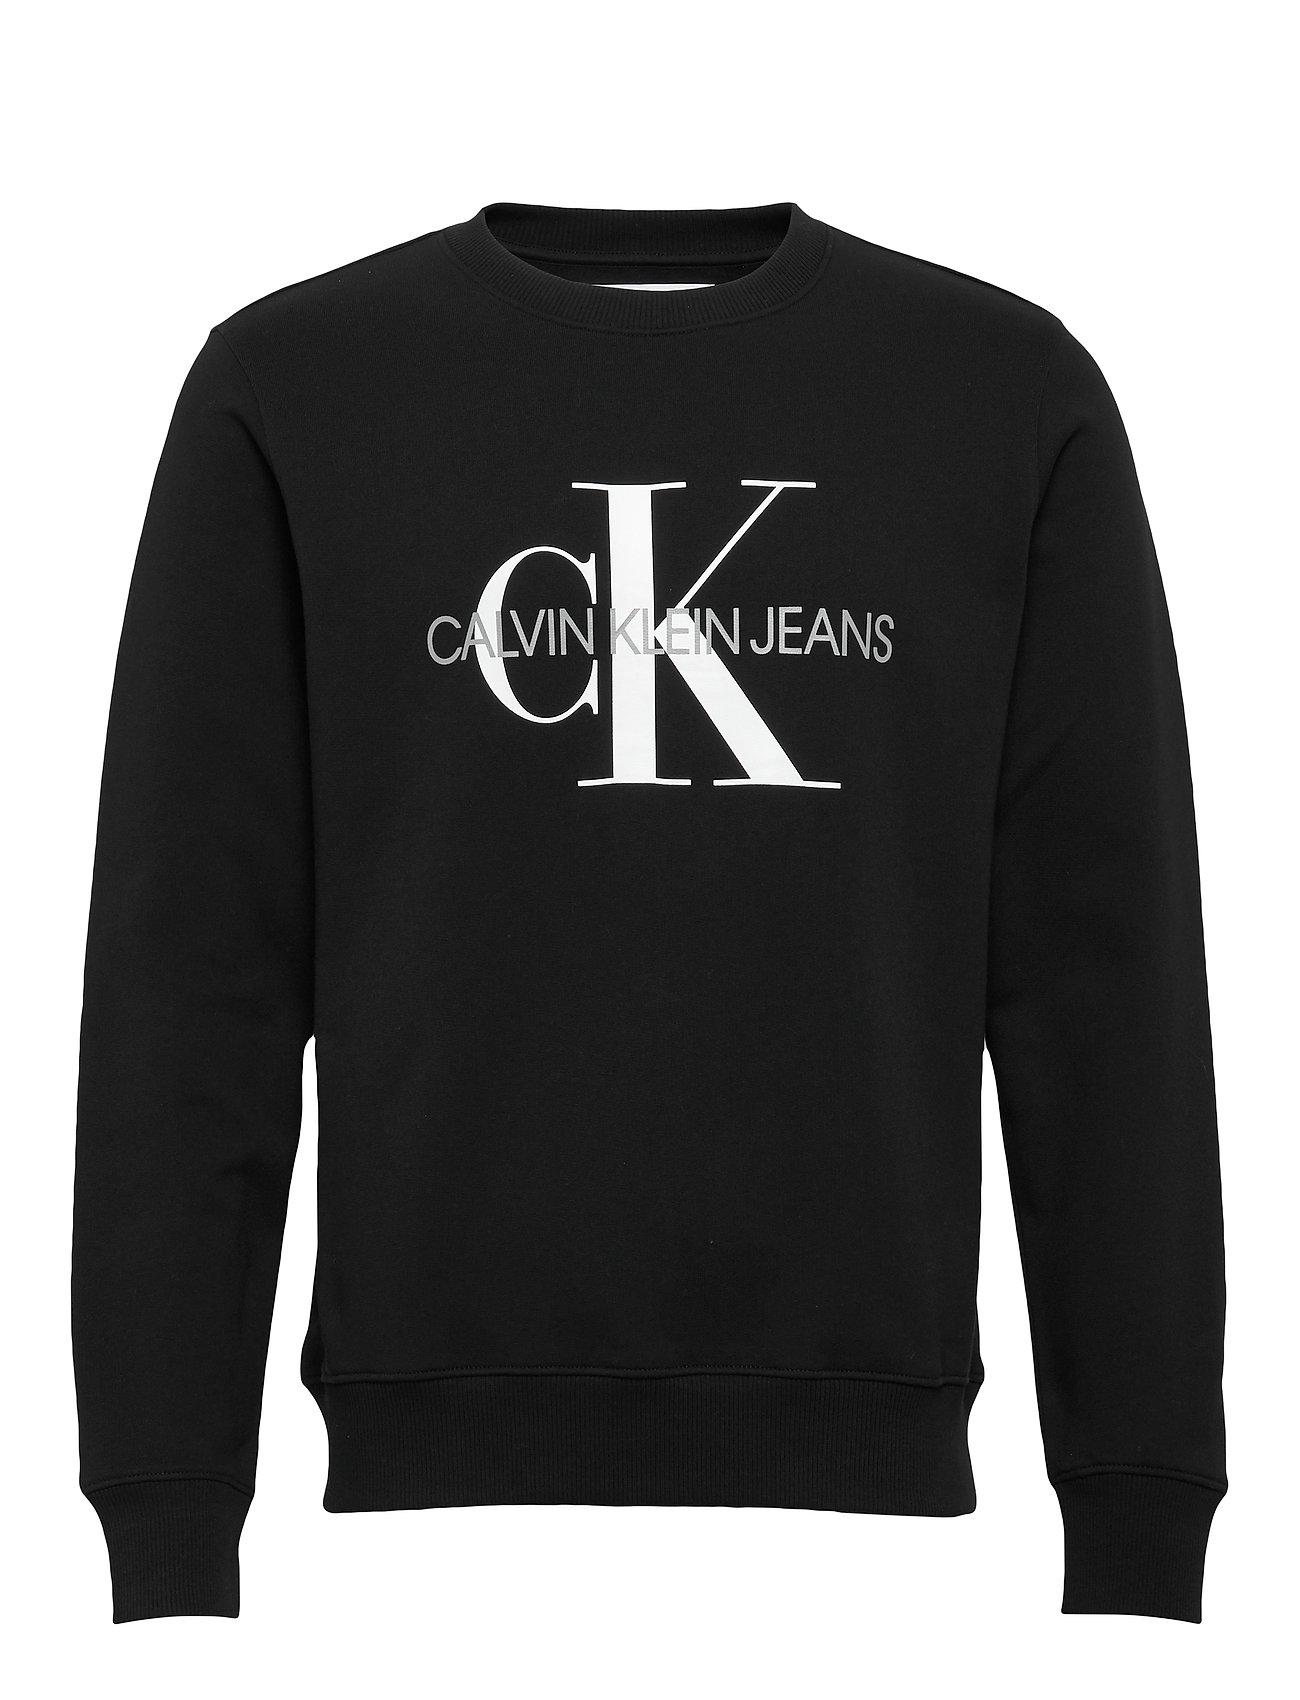 Calvin Klein Jeans ICONIC MONOGRAM CREWNECK - CK BLACK